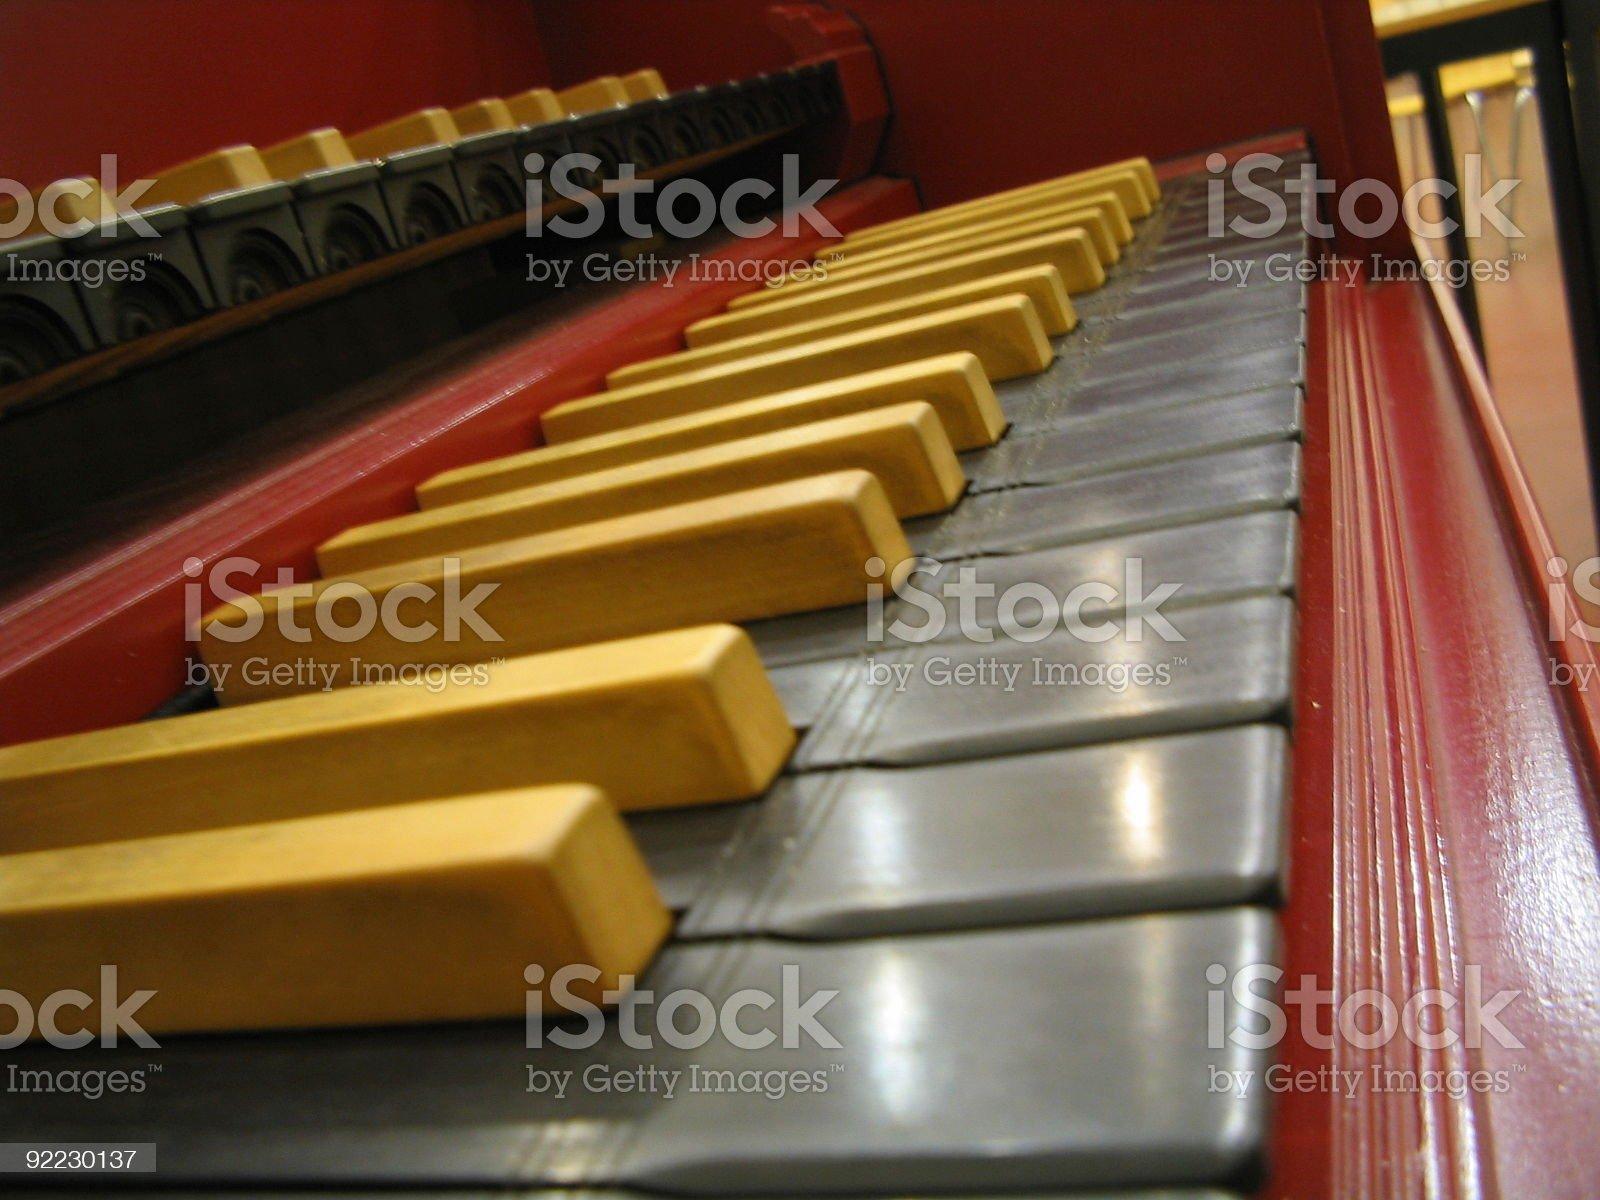 Harpsichord keys royalty-free stock photo